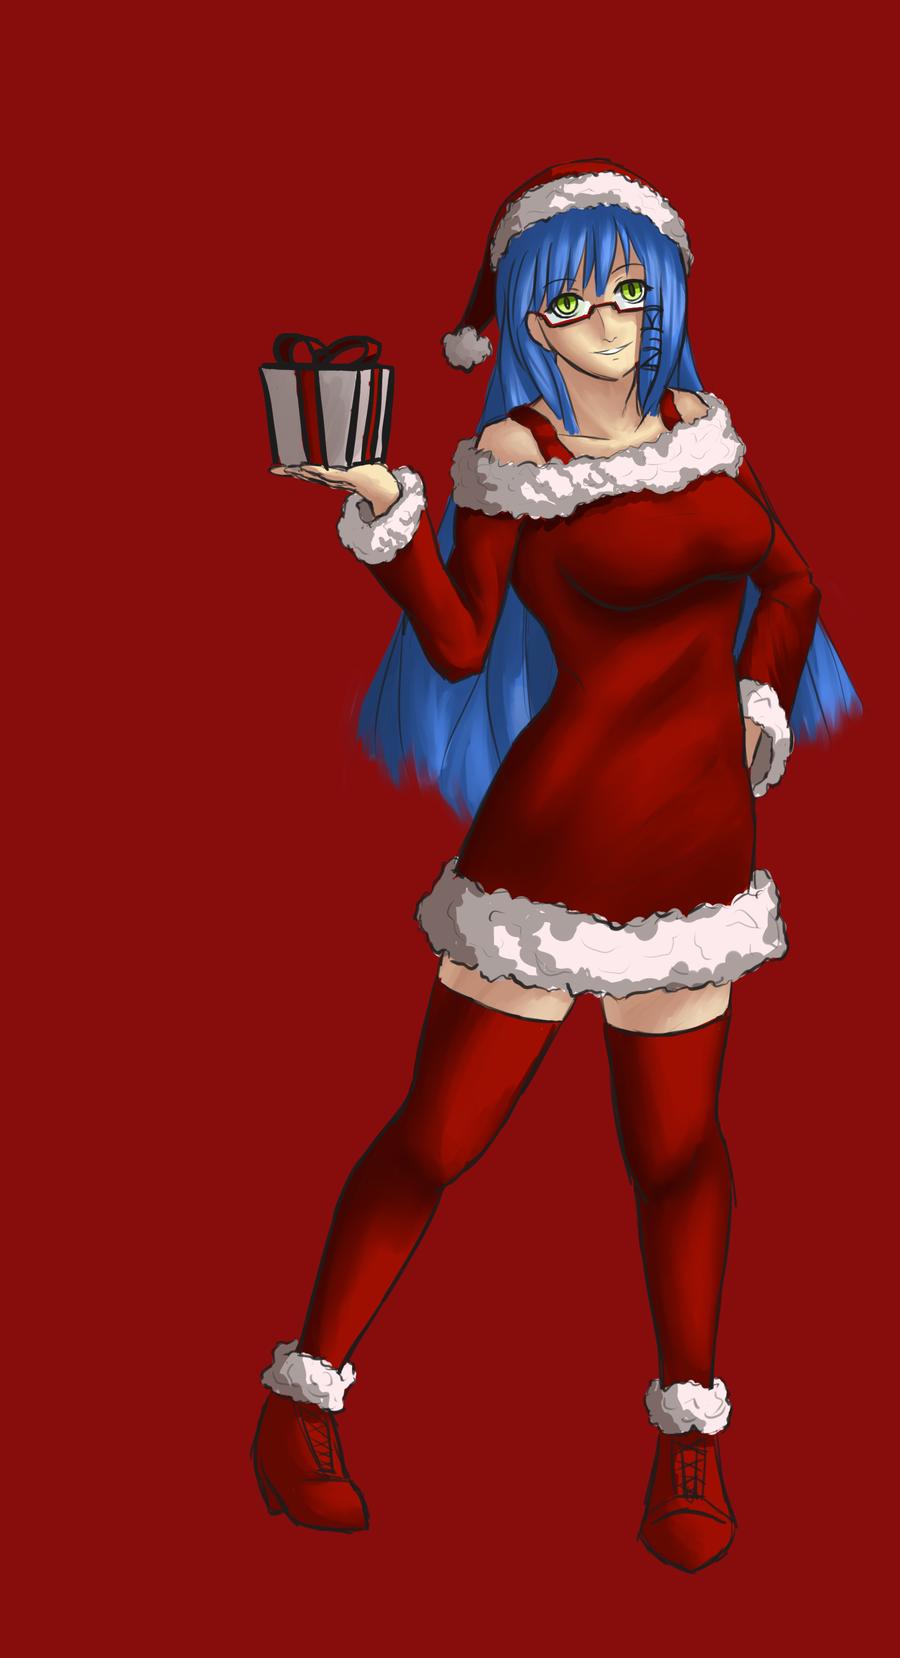 Merry Christmas. by dudeunderscore